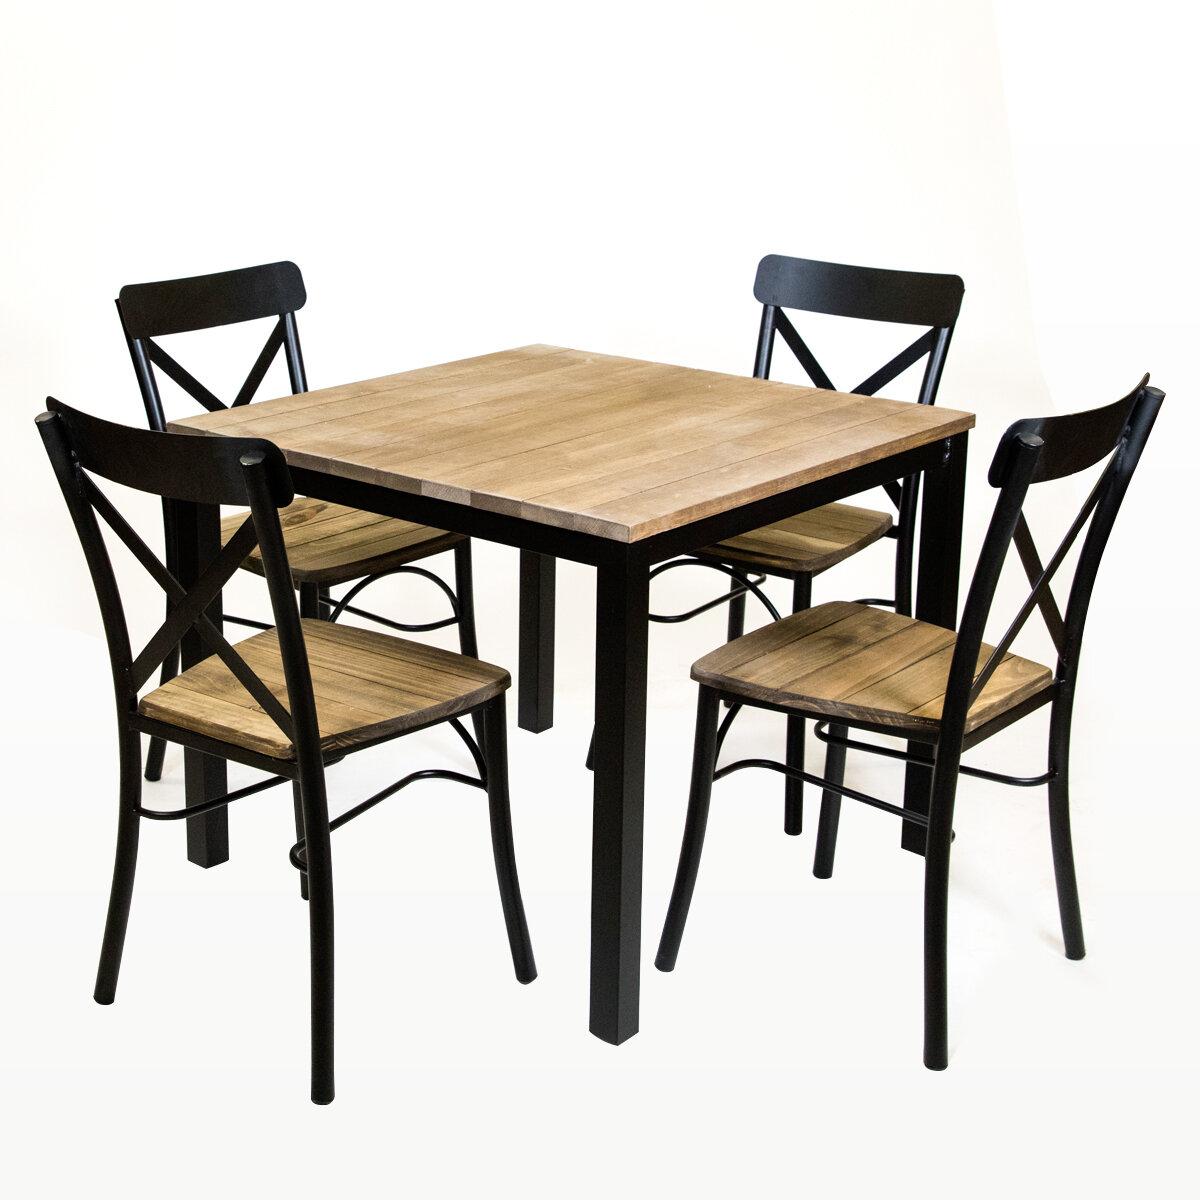 Rezfurniture Standard Square Vintage Solid Wood Dining Table Reviews Wayfair